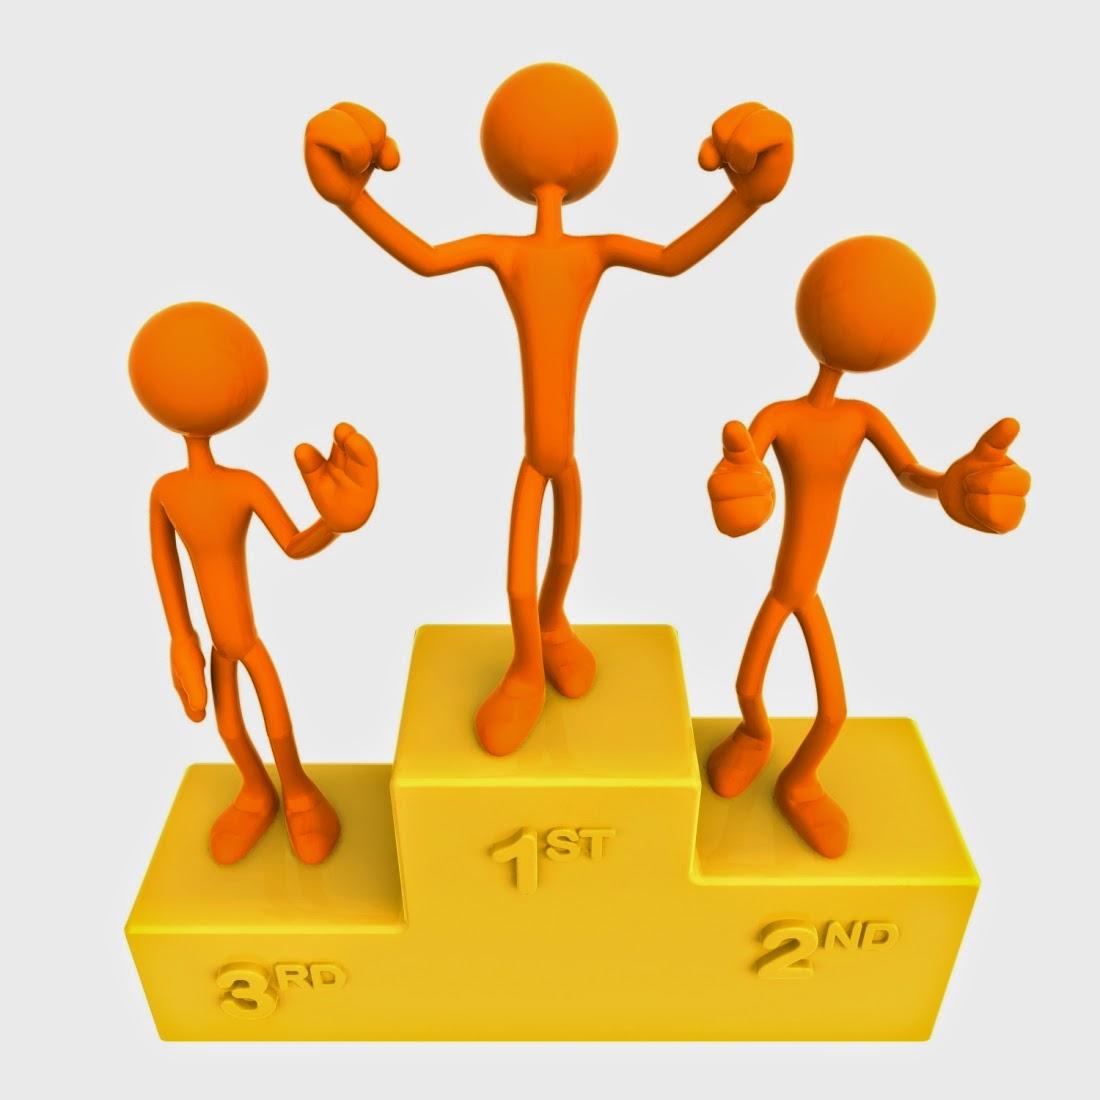 Конкурсы для сотрудников внутри компаний